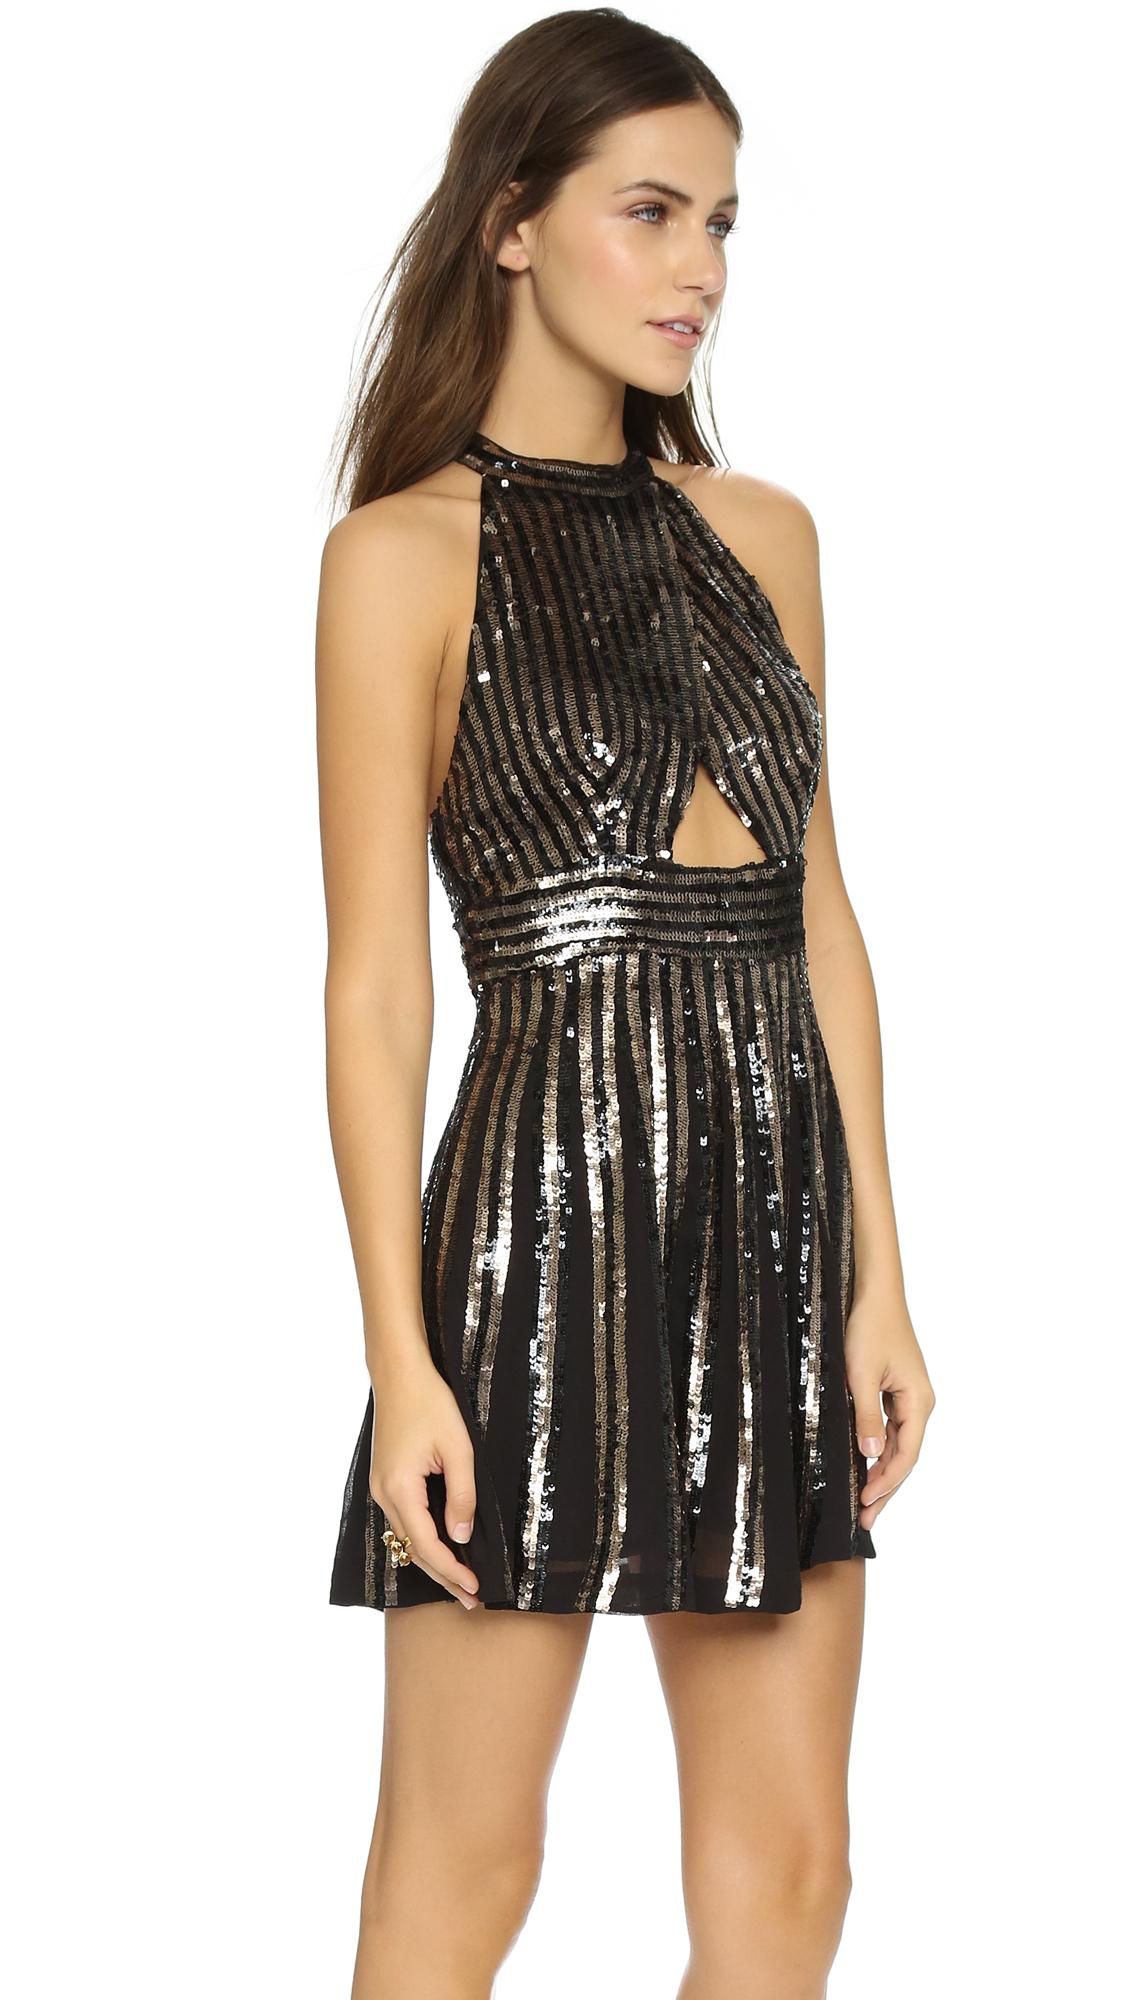 Free people Sequin Stripe Mini Dress - Black in Black - Lyst